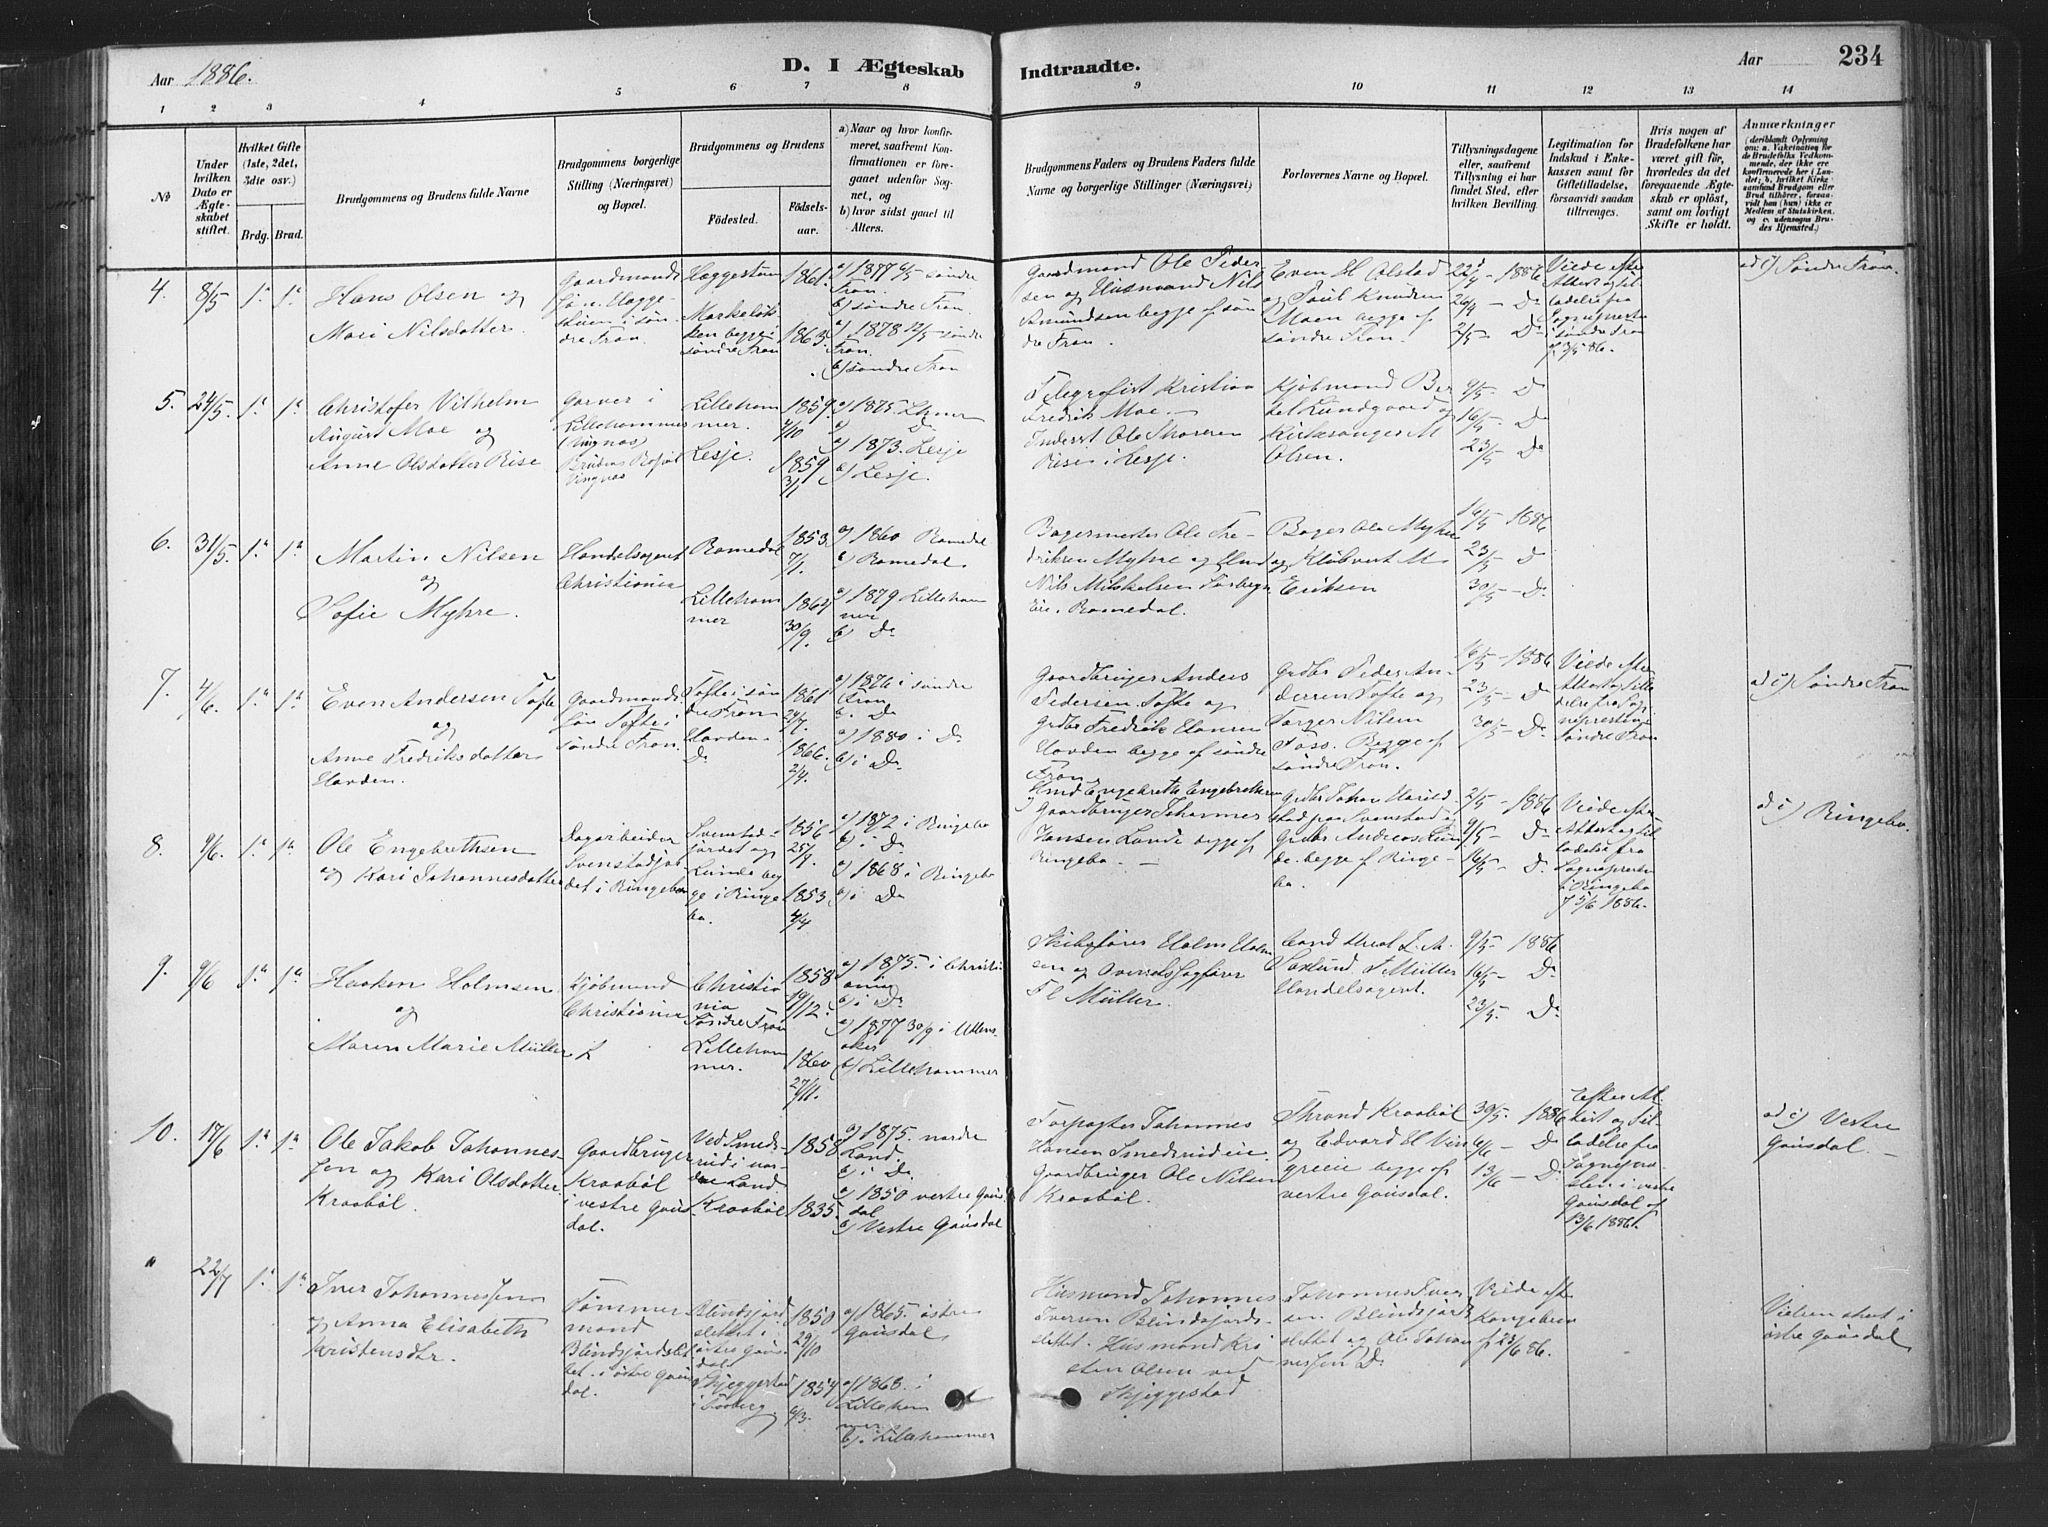 SAH, Fåberg prestekontor, H/Ha/Haa/L0010: Ministerialbok nr. 10, 1879-1900, s. 234